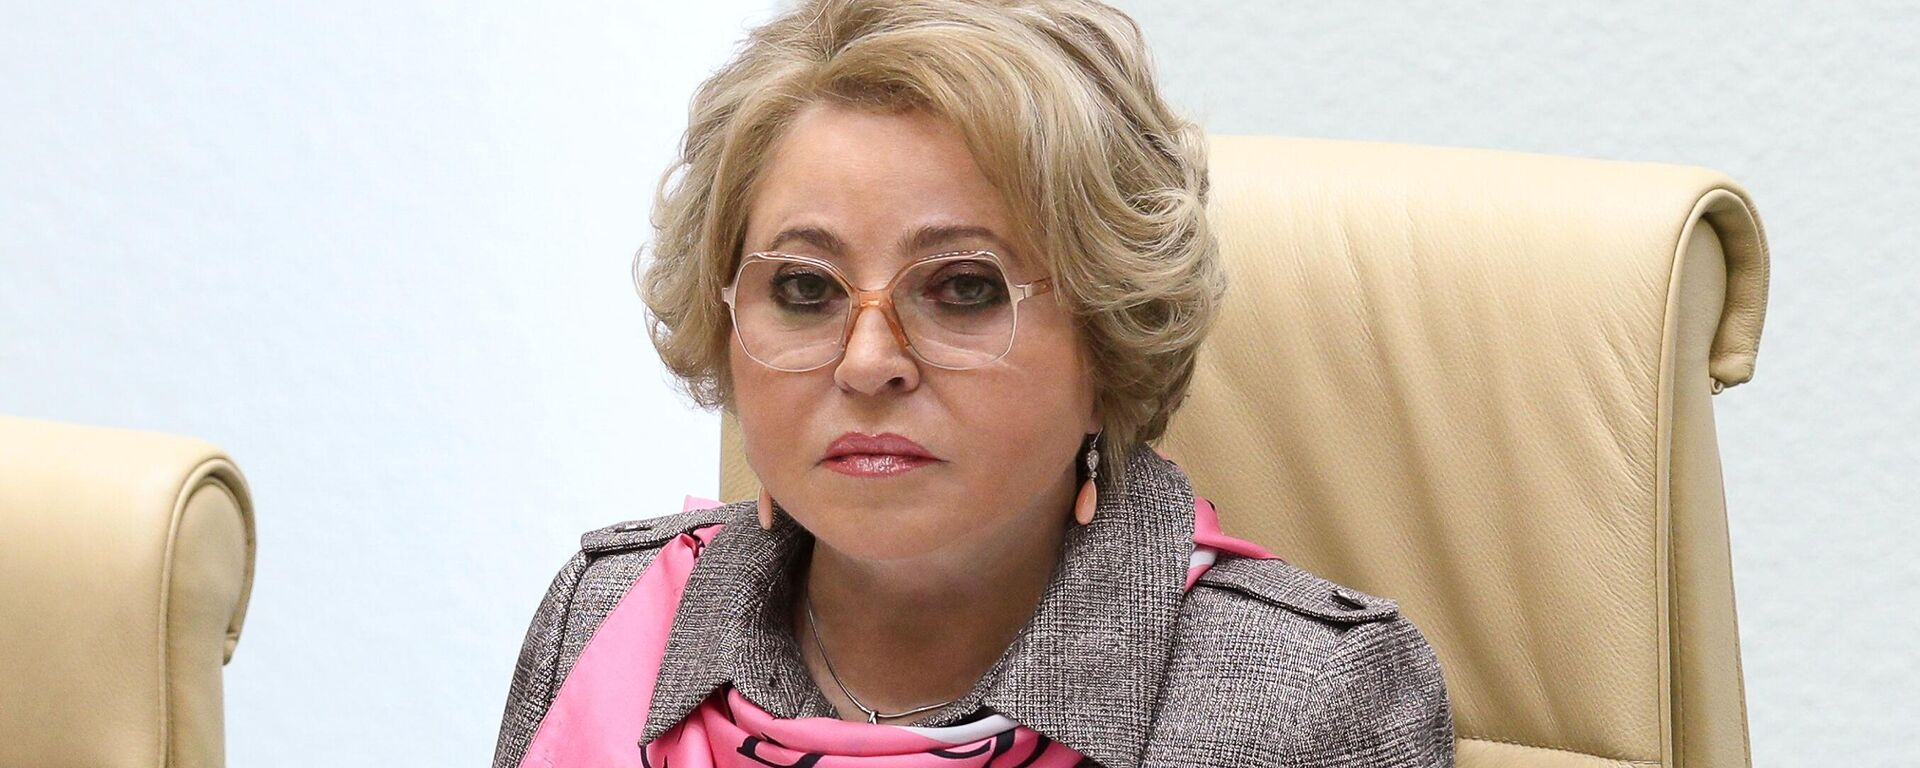 Председатель Совета Федерации РФ Валентина Матвиенко - Sputnik Таджикистан, 1920, 07.09.2021